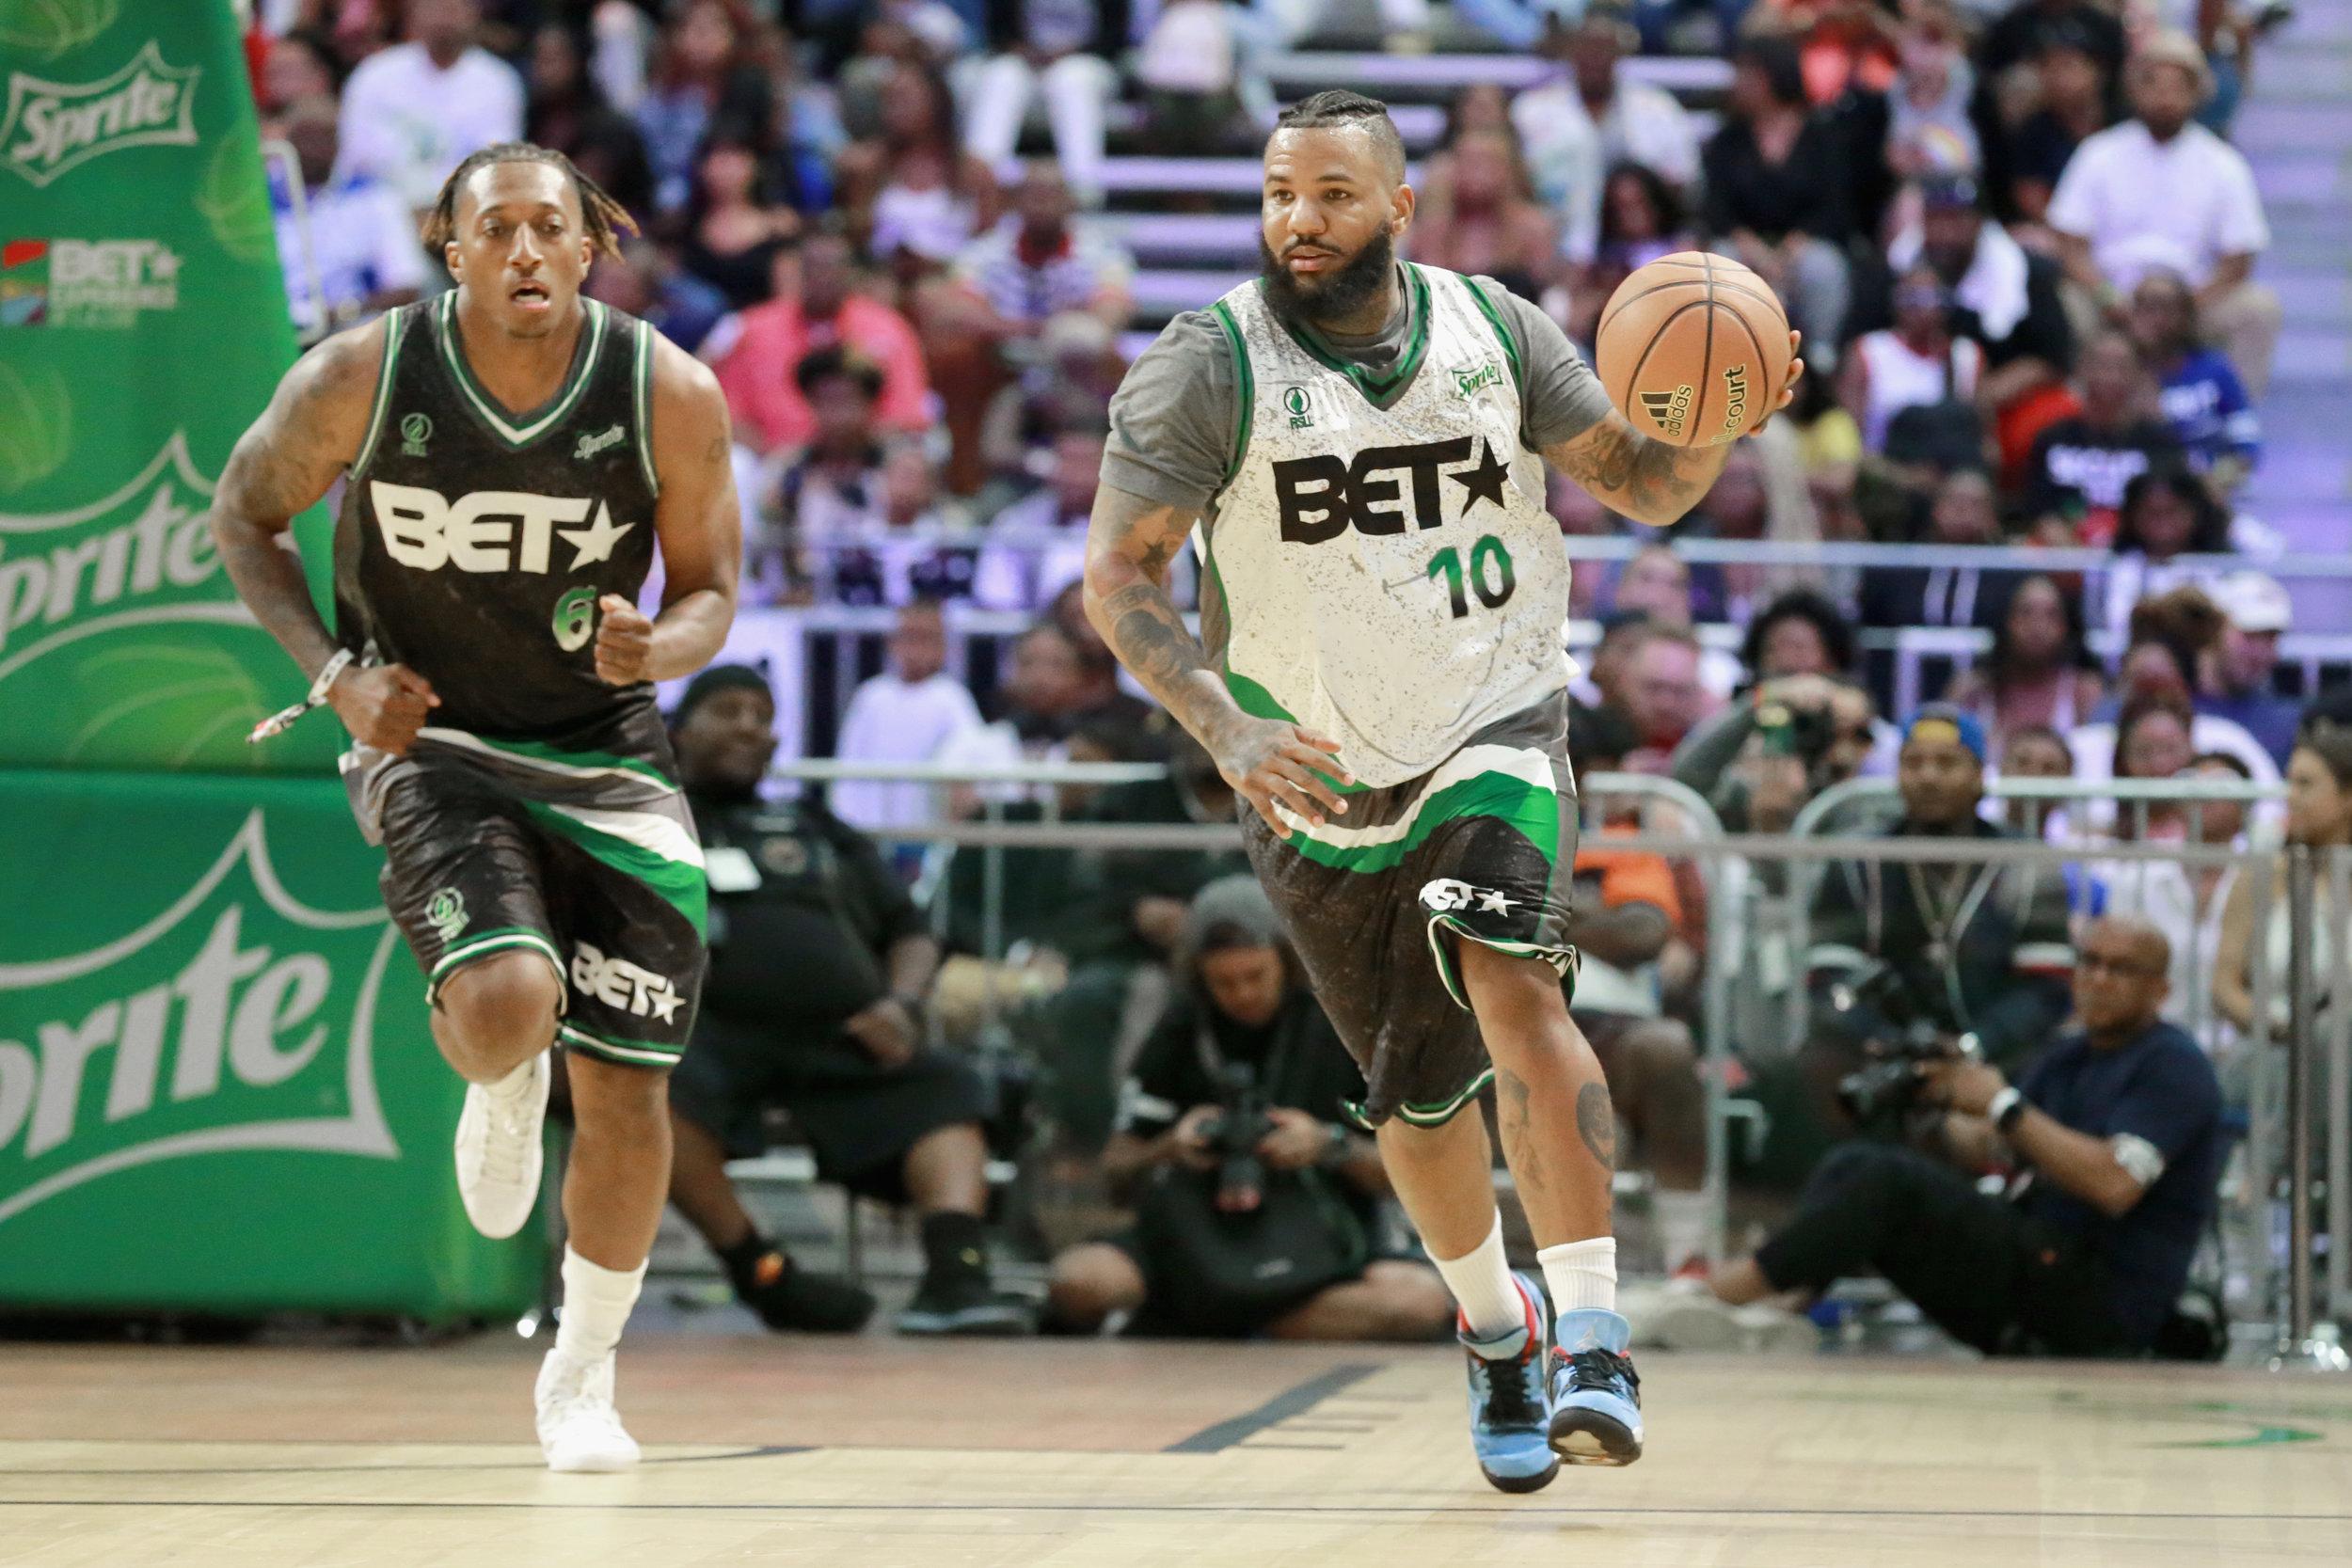 betx18_celeb_basketball_game.jpg